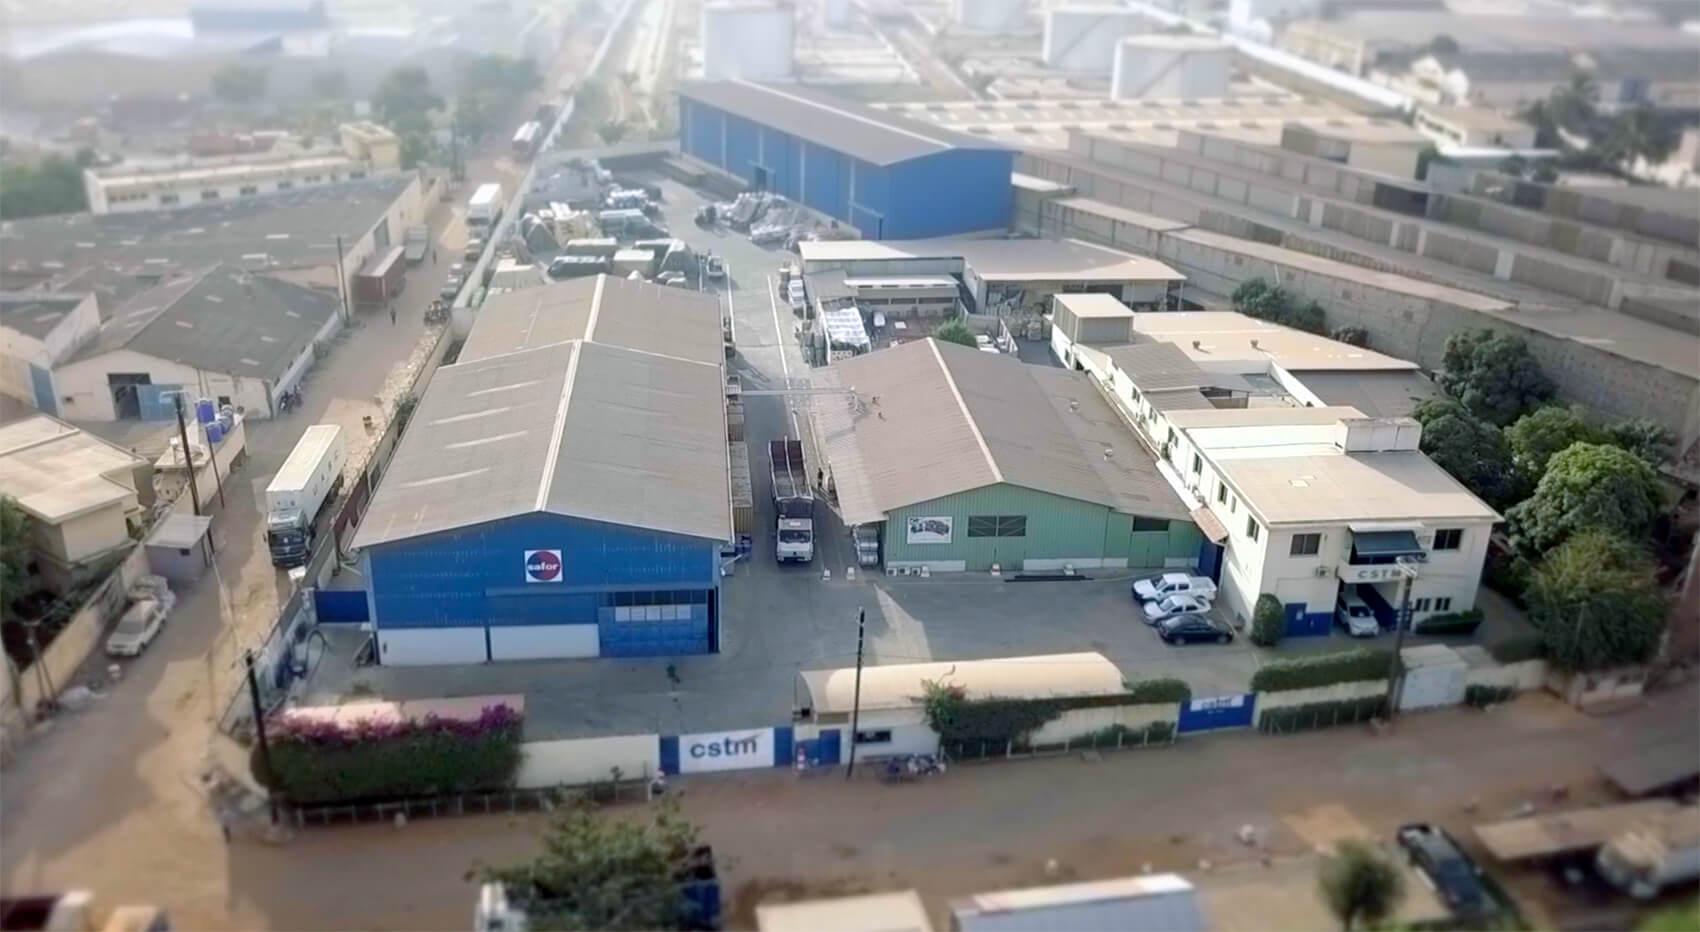 cstm-safor-usine